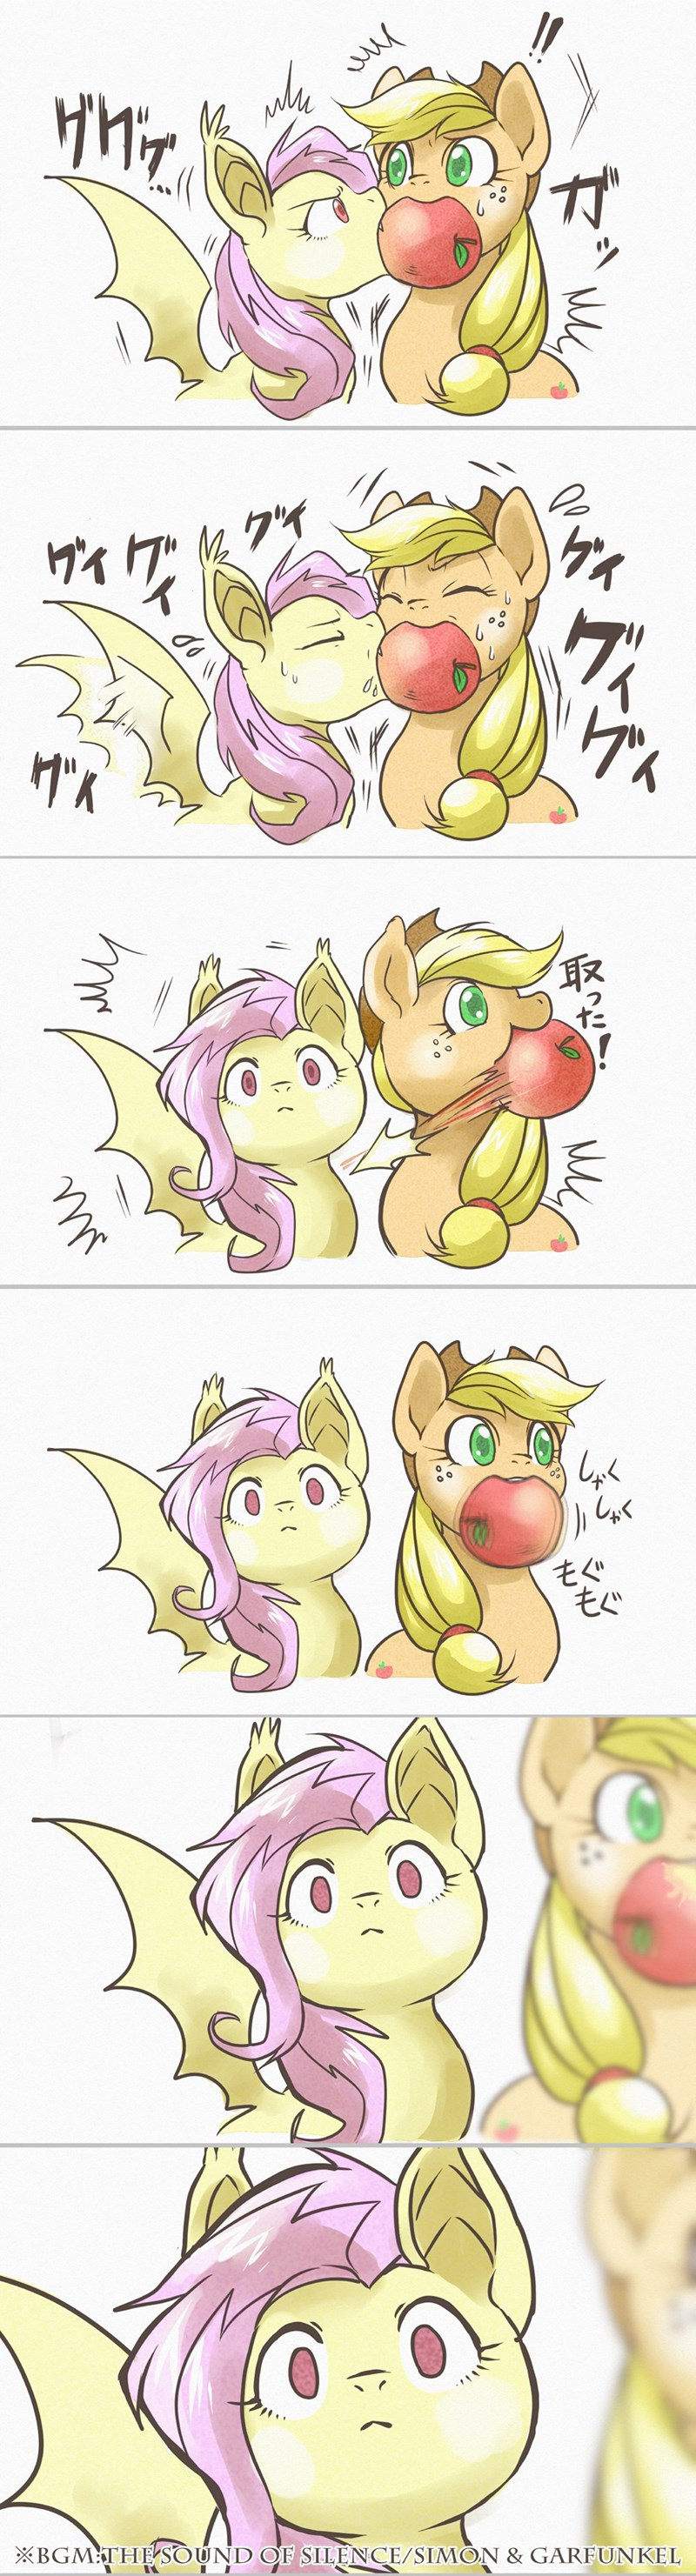 flutterbat applejack ponify comic fluttershy - 8805726720